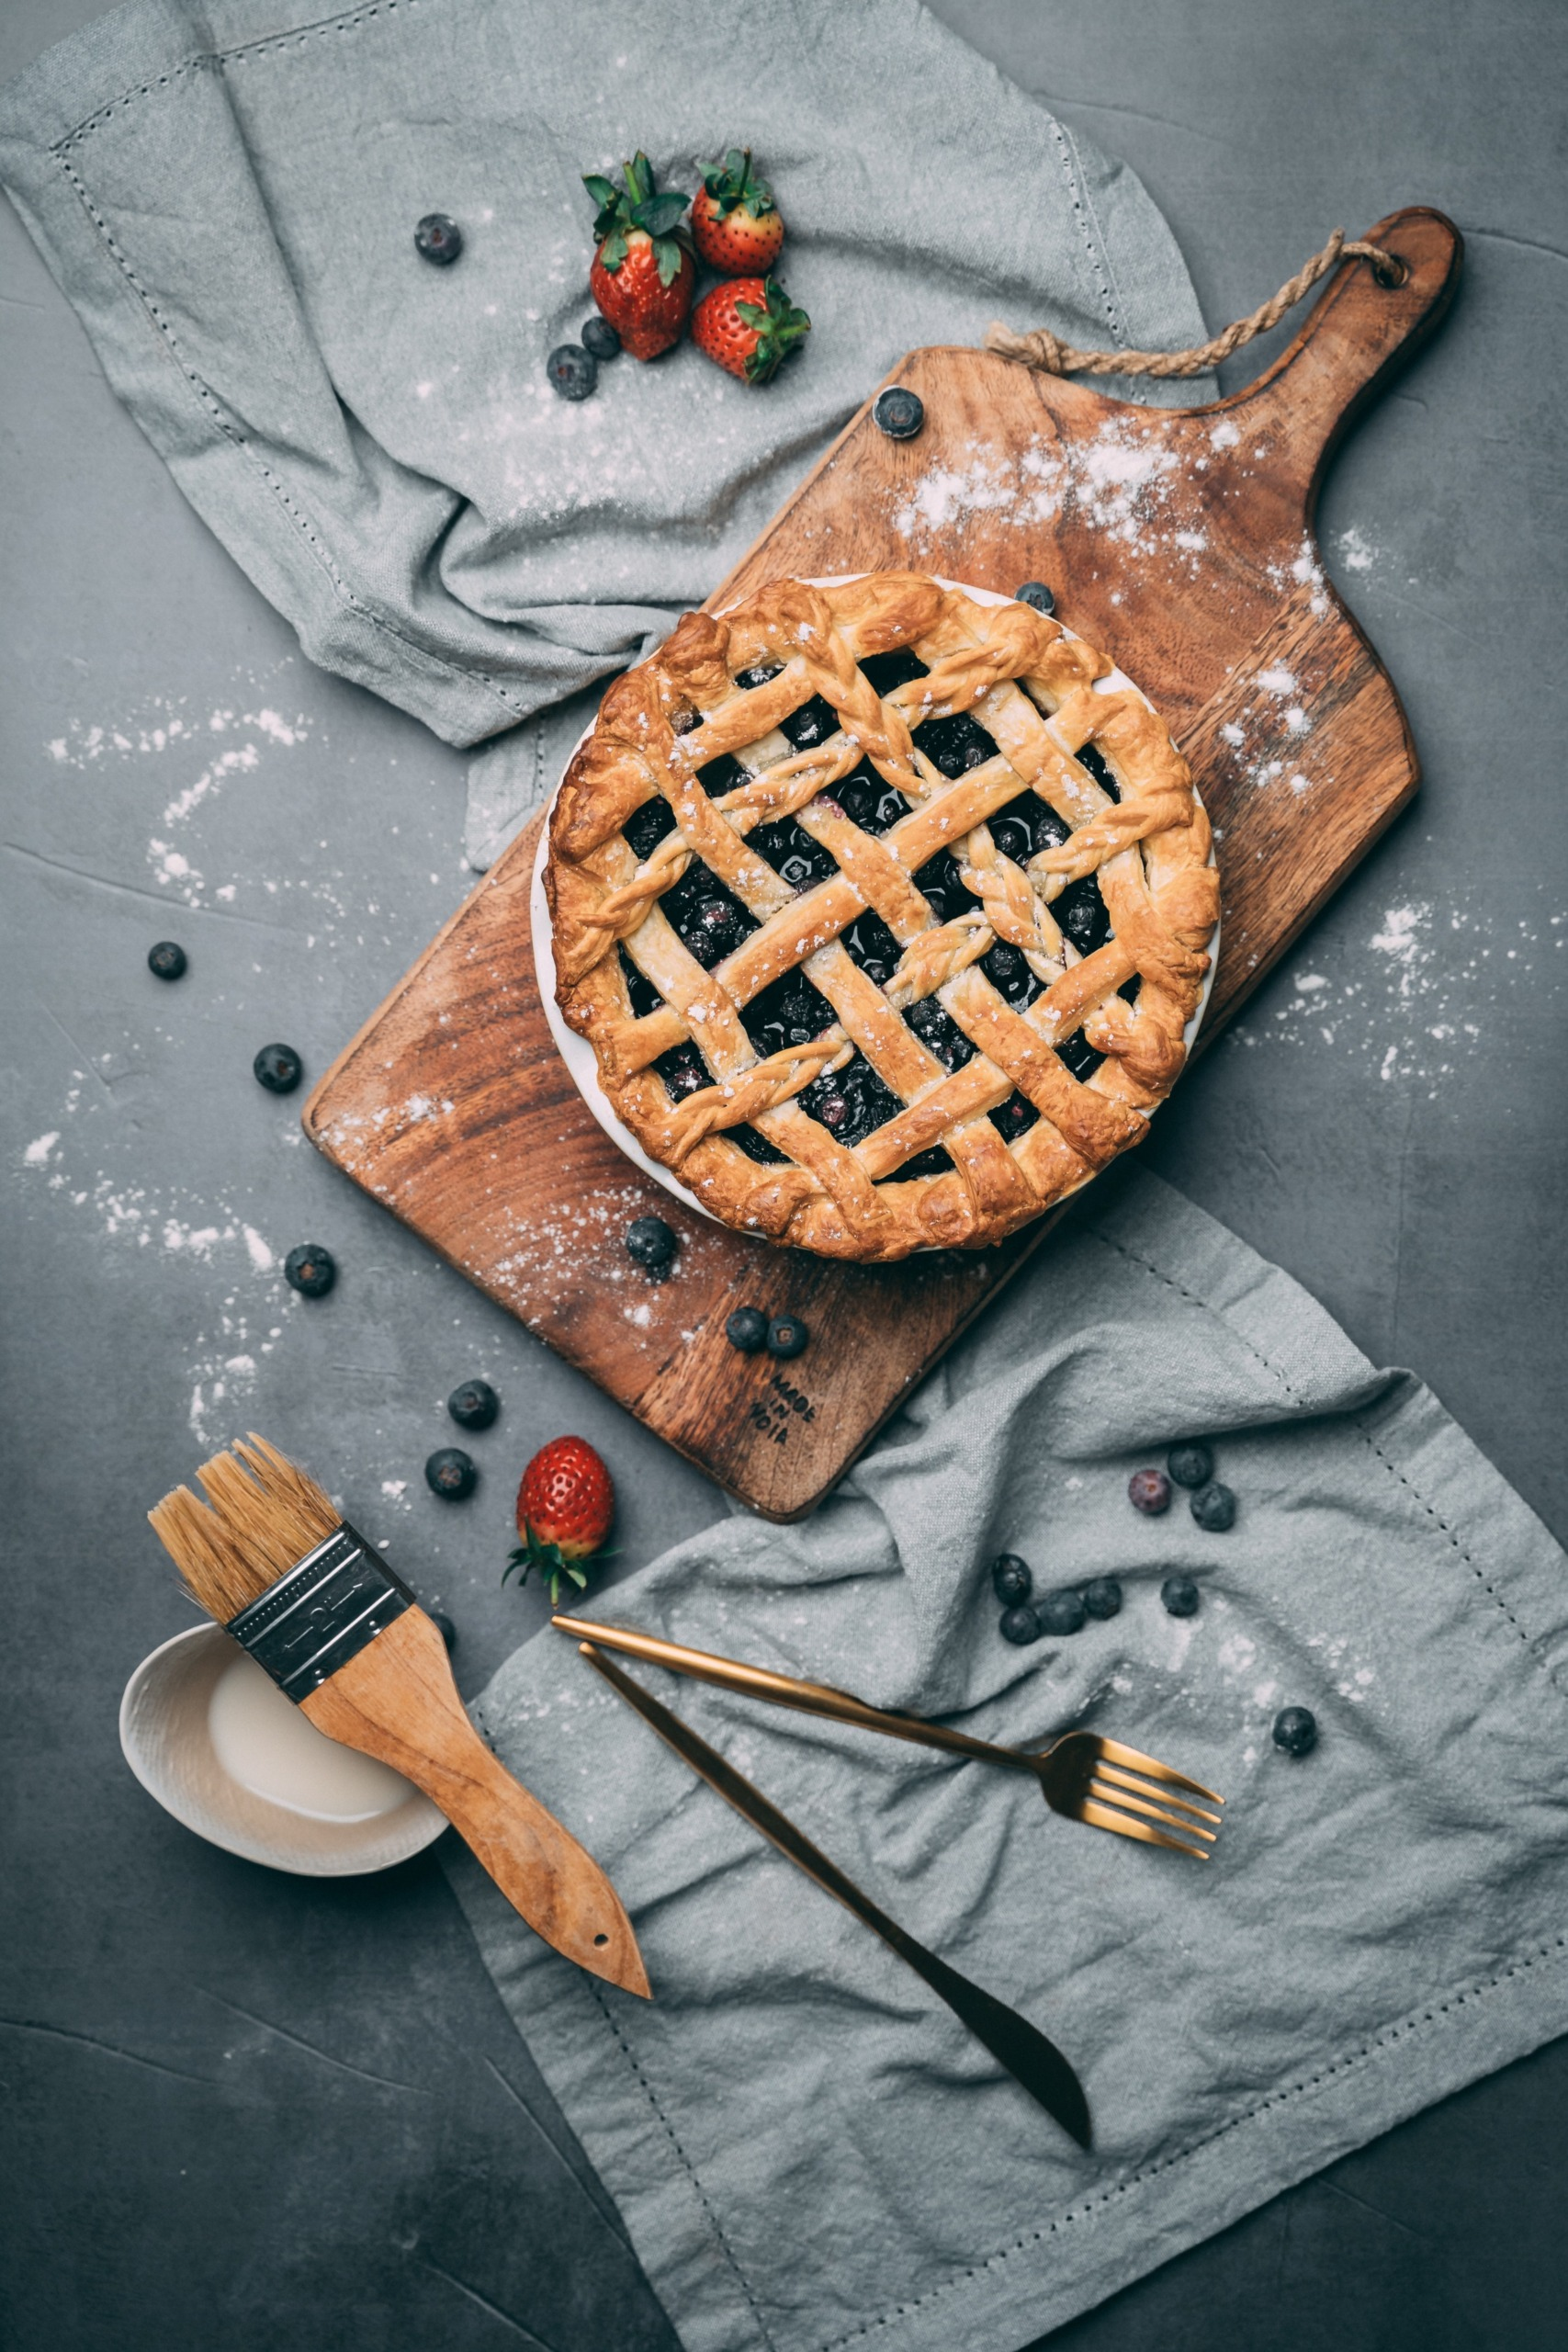 blueberry pie image